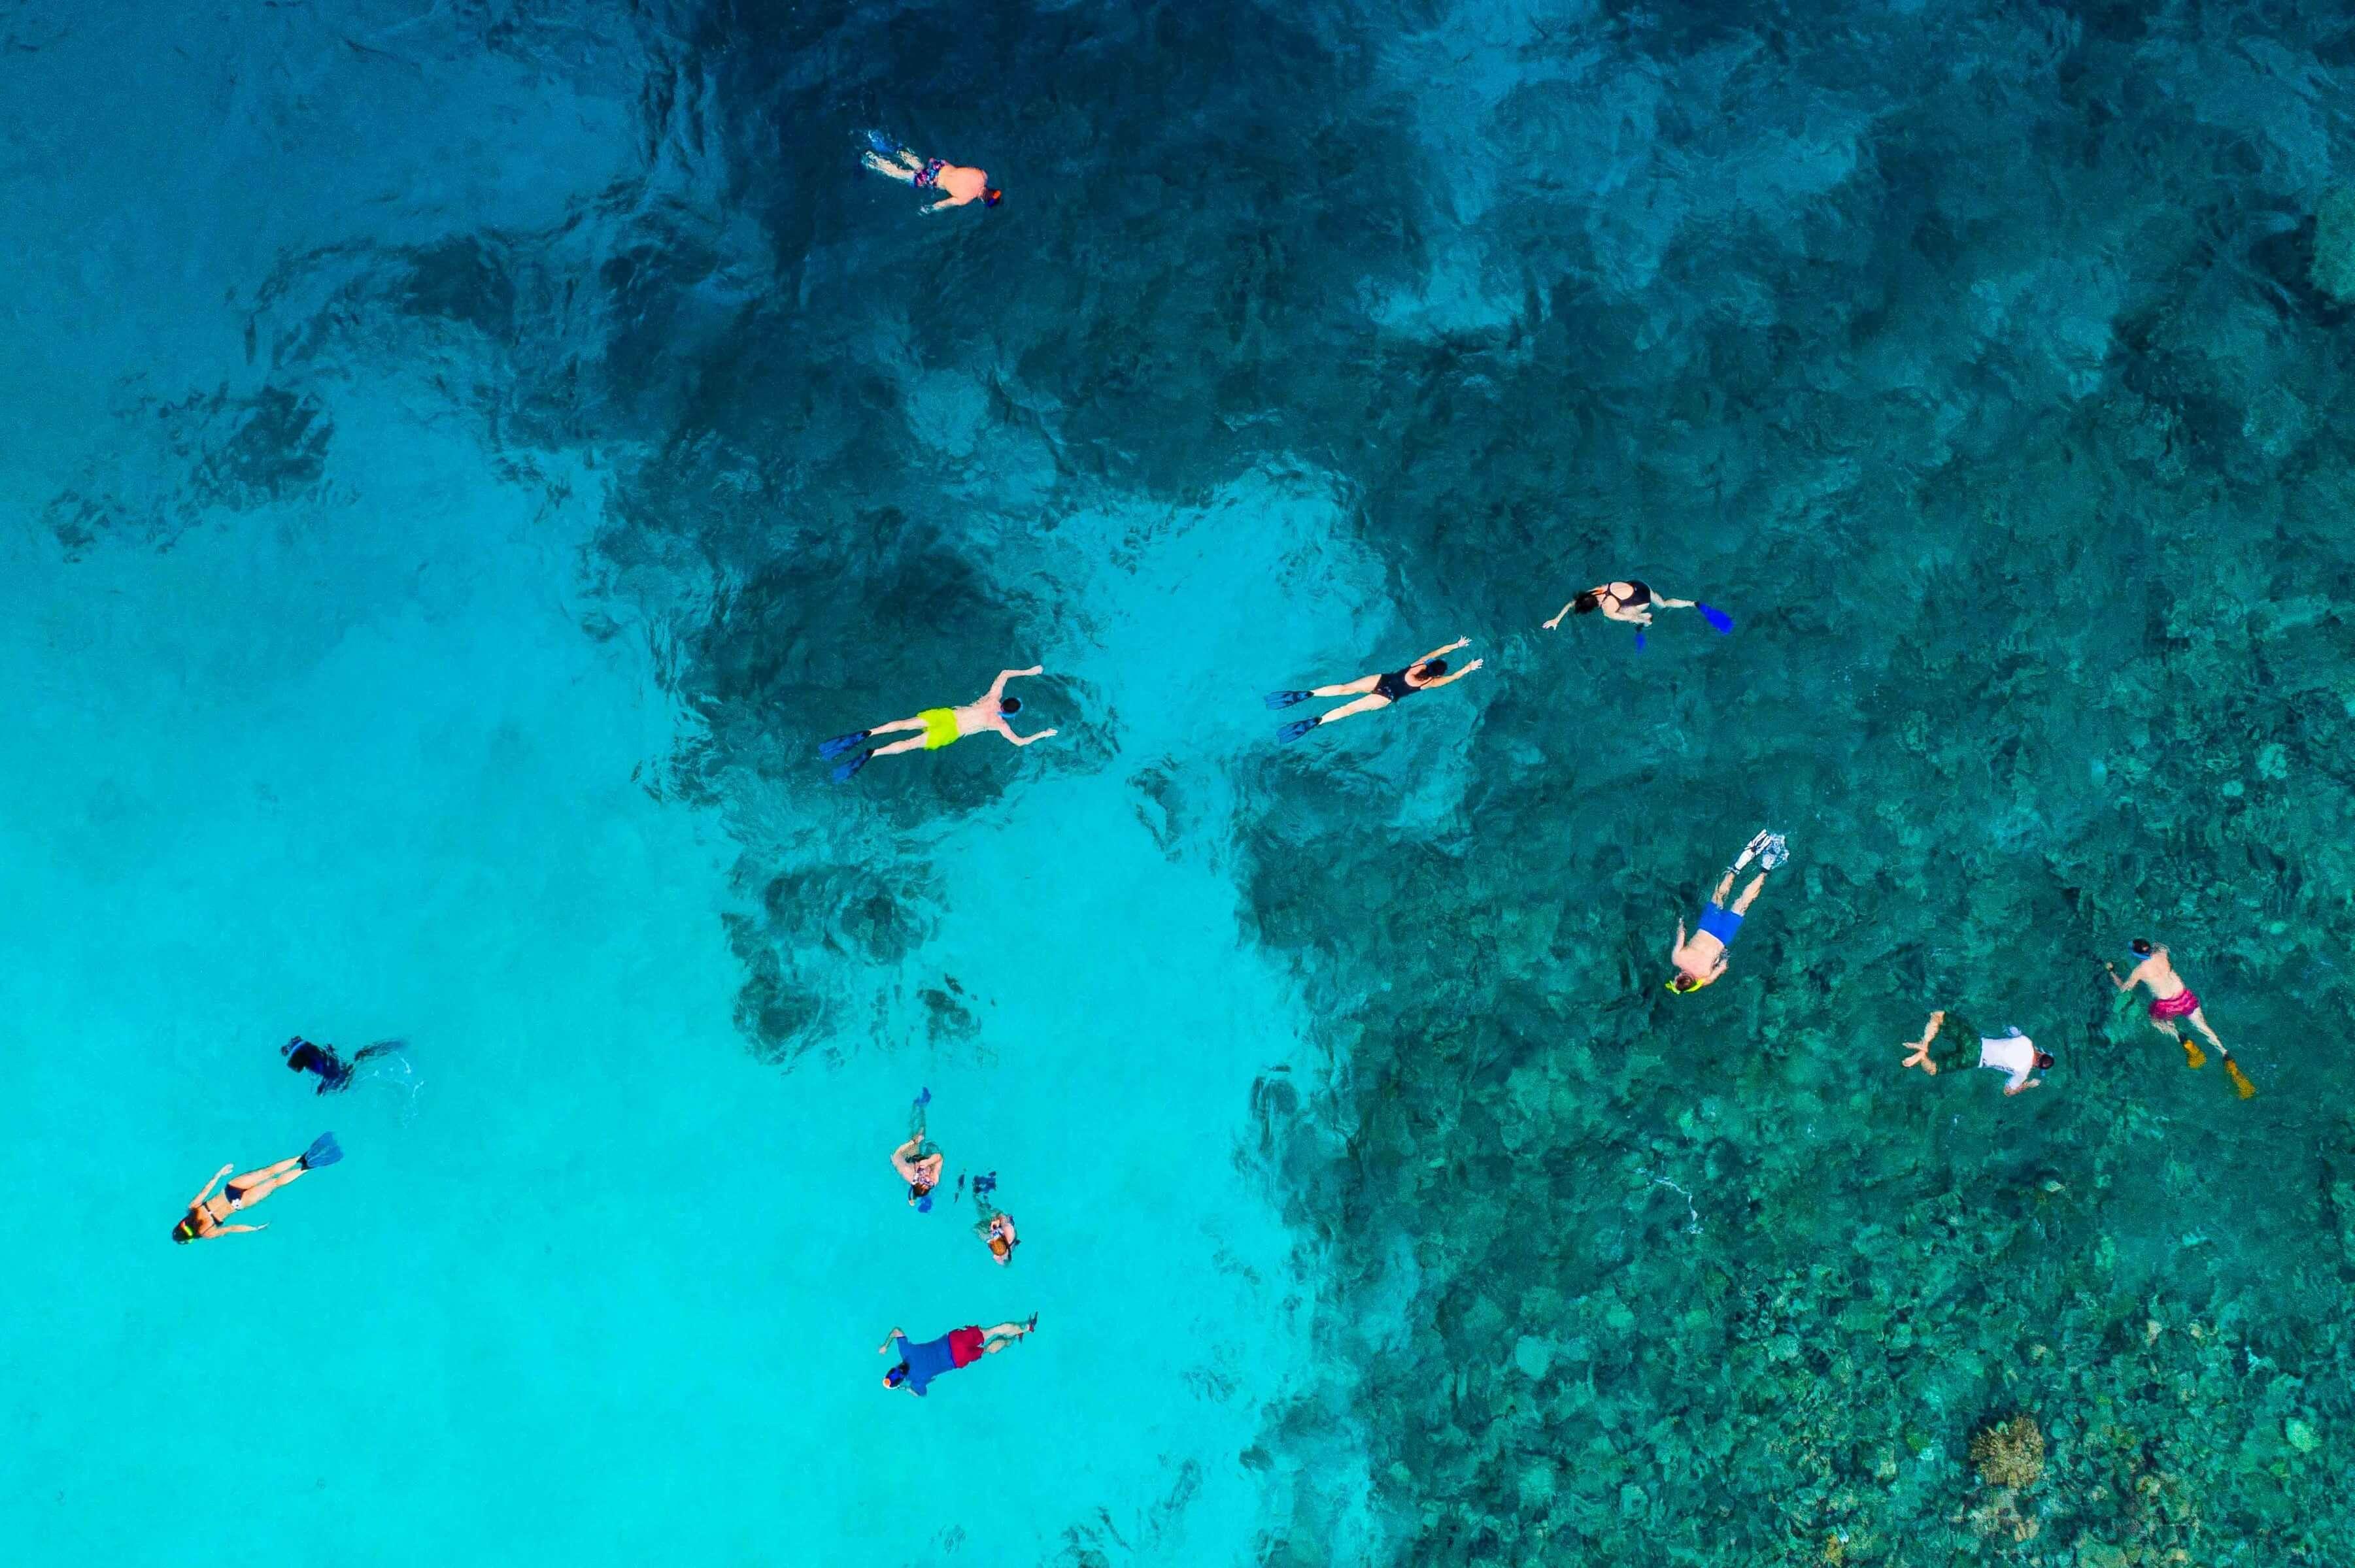 Maldives Day Tours (All-inclusive w/ Price & Itinerary)